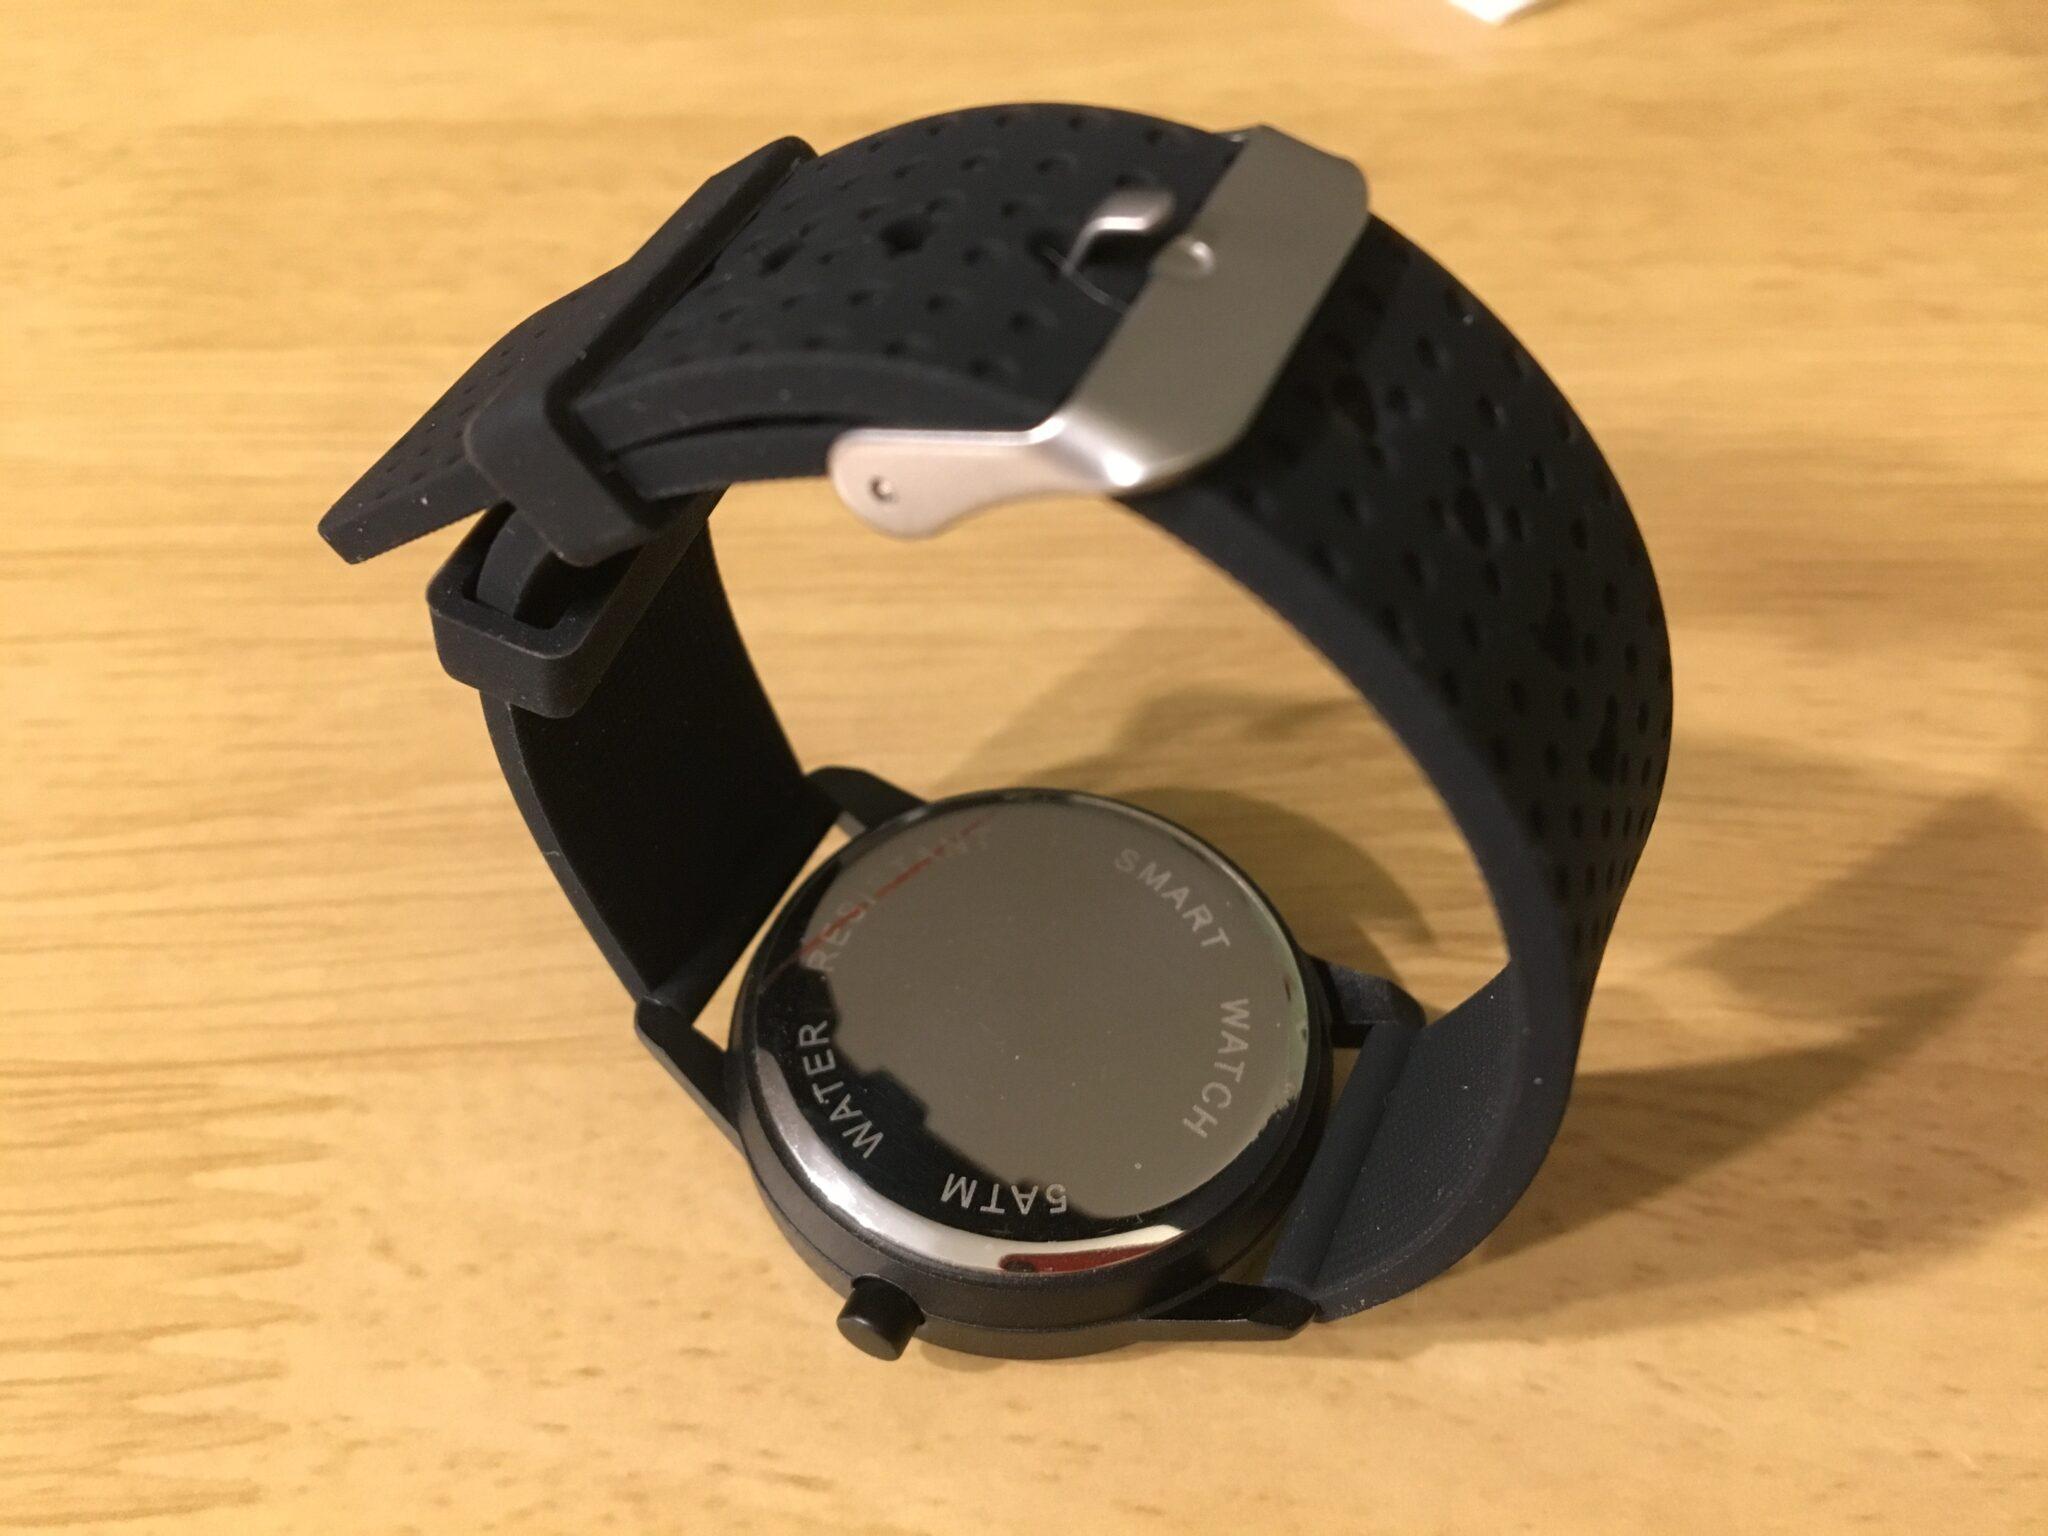 Lenovo Watch 9 (Smart Watch) & English Manual | an Ephemeral